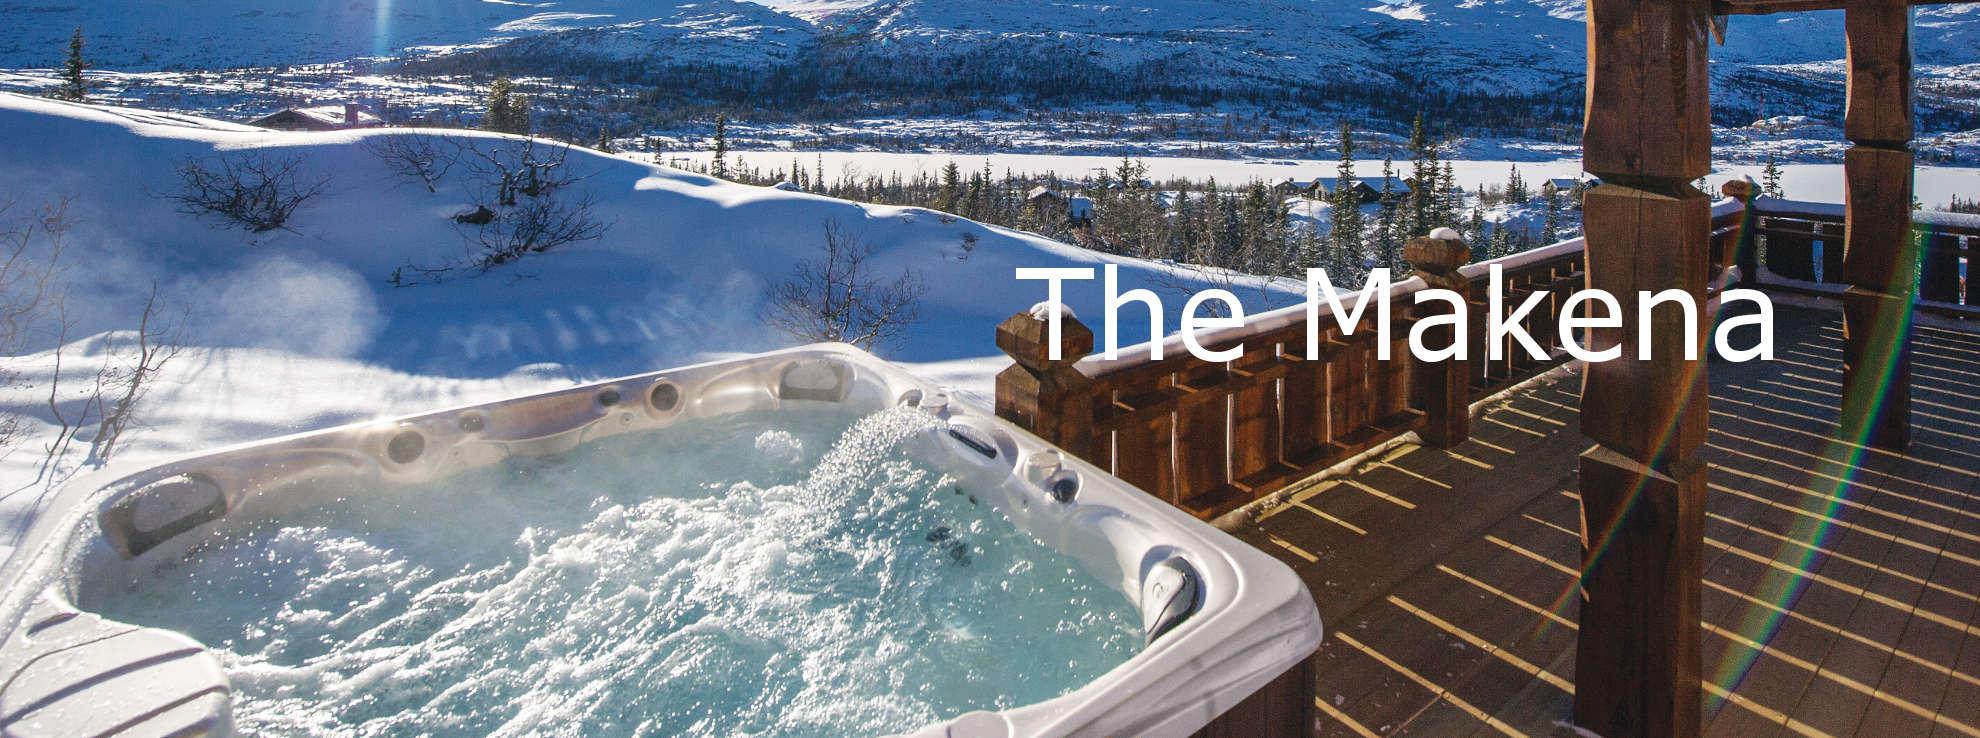 Makena Large Lounger hot tub MA NH